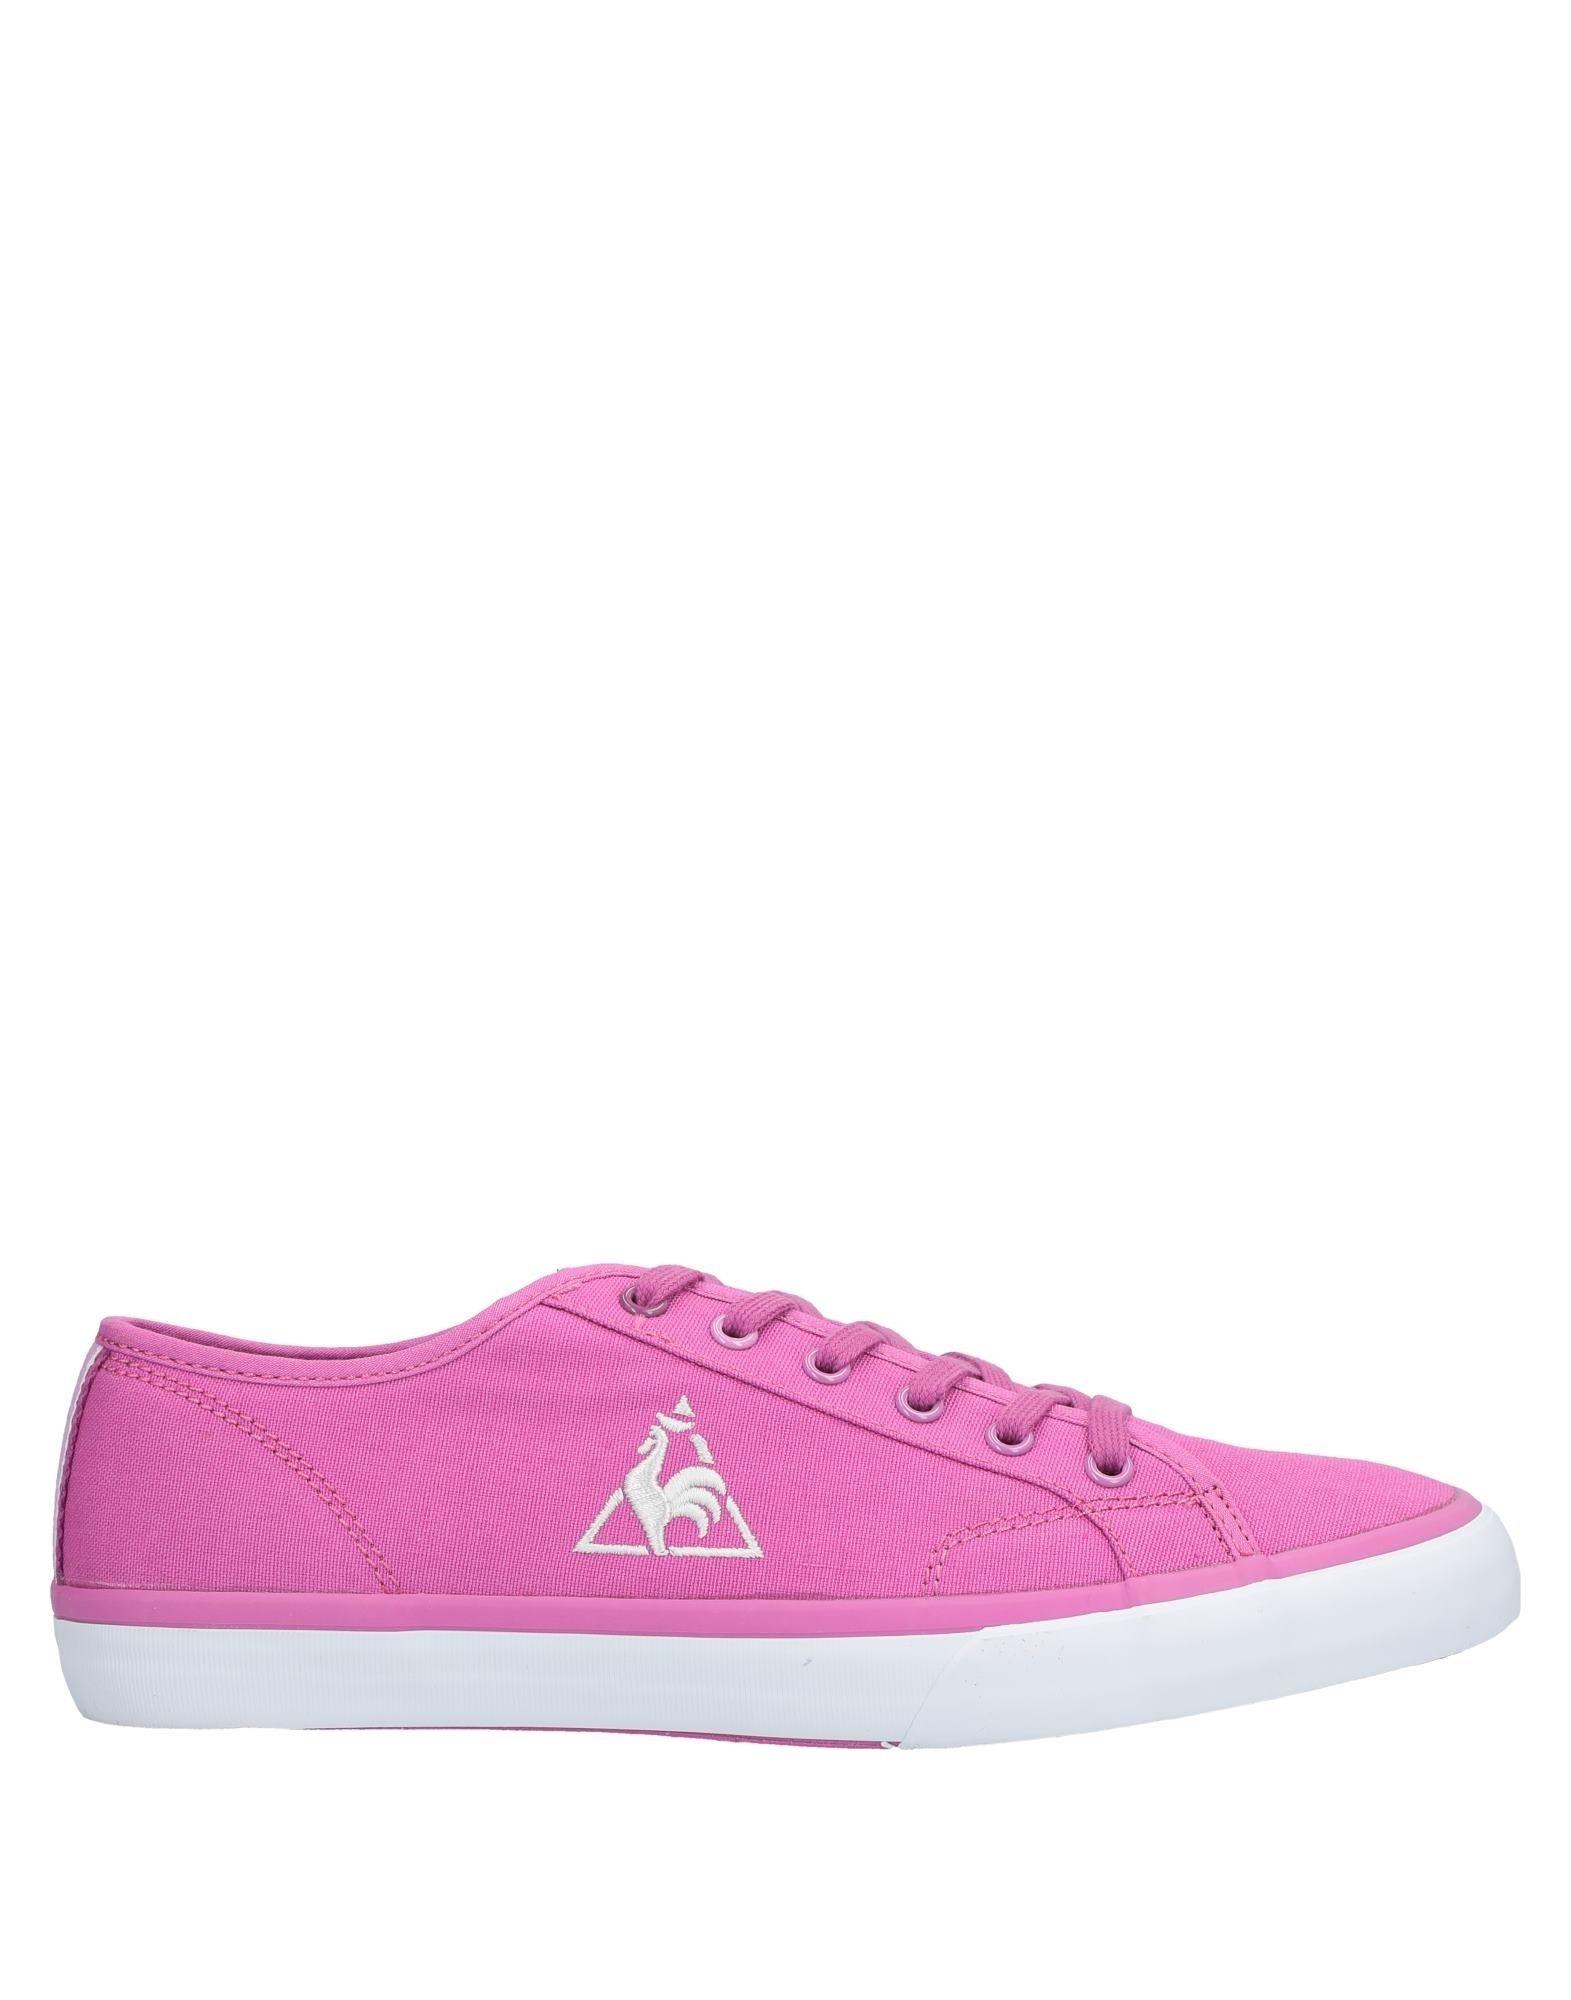 Sneakers Le Coq Sportif Donna - 11539184PJ